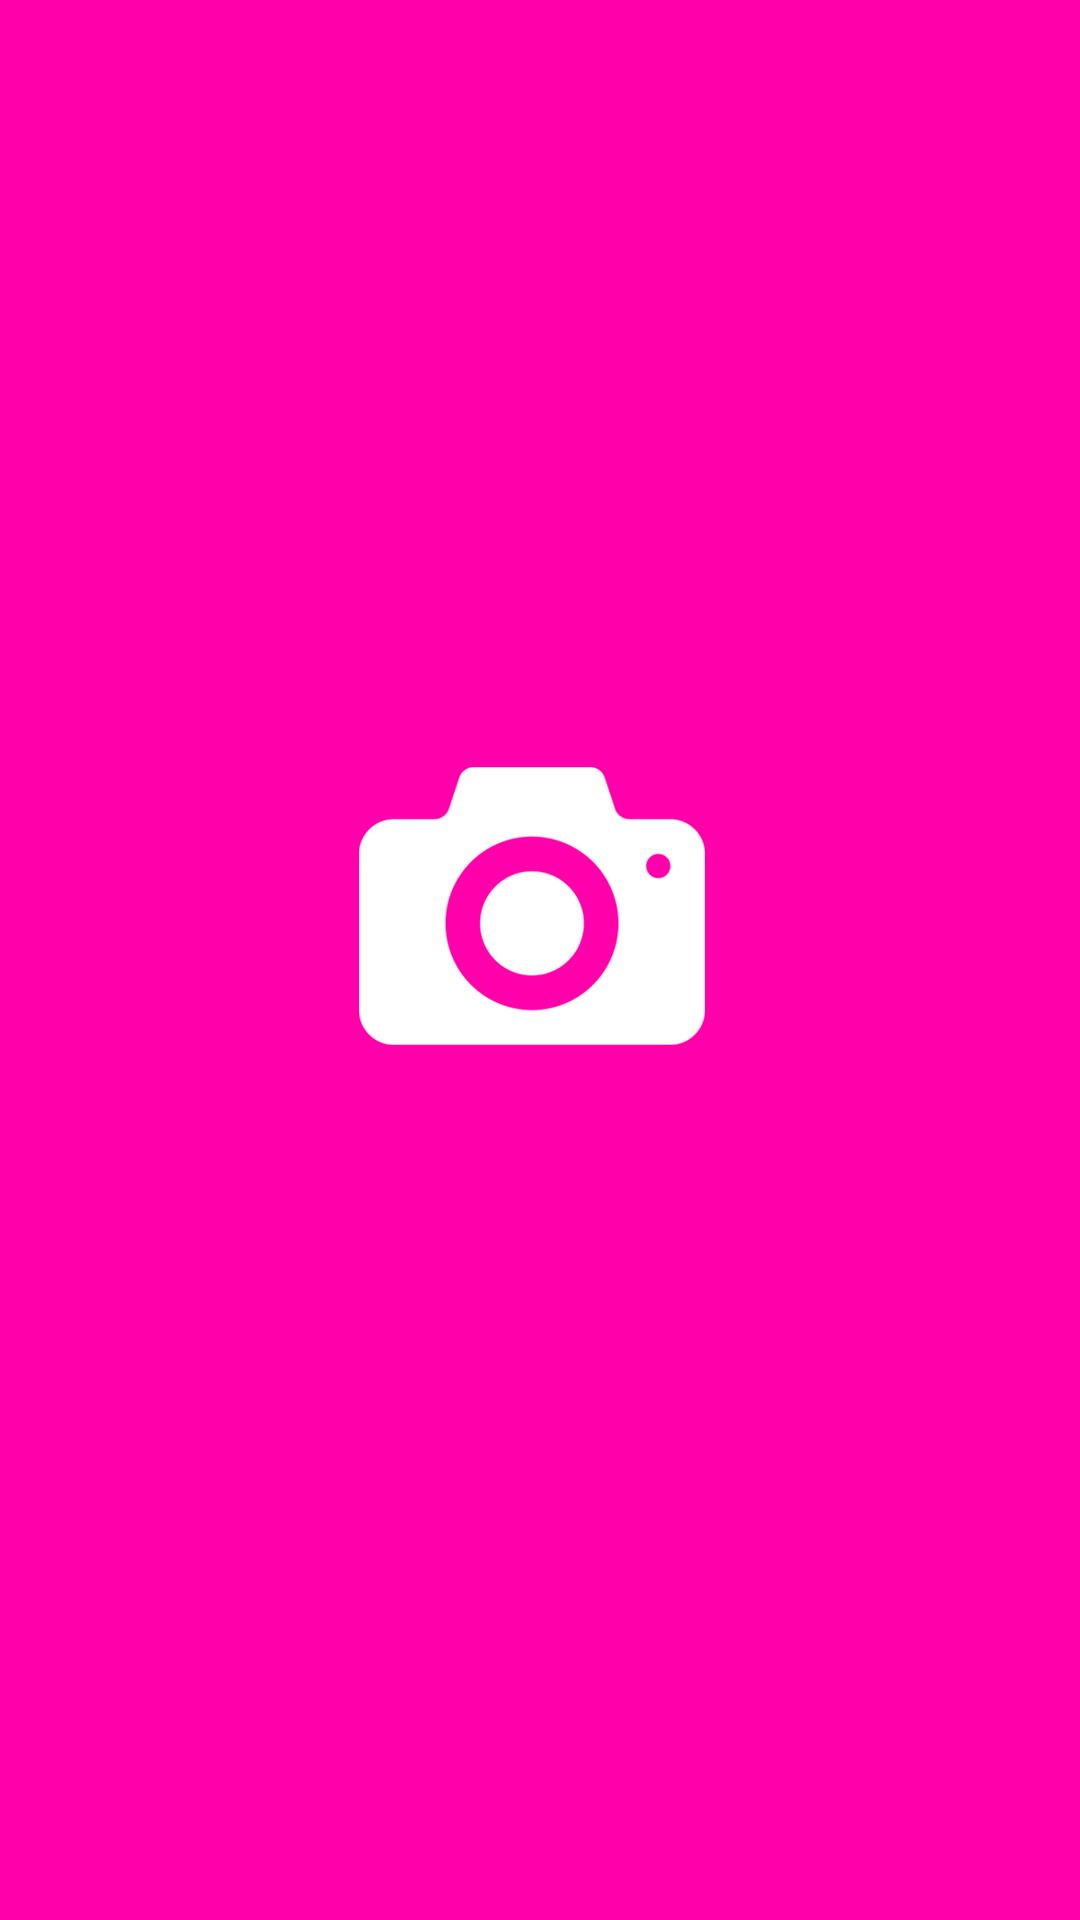 Capas para destaques do Instagram: neon